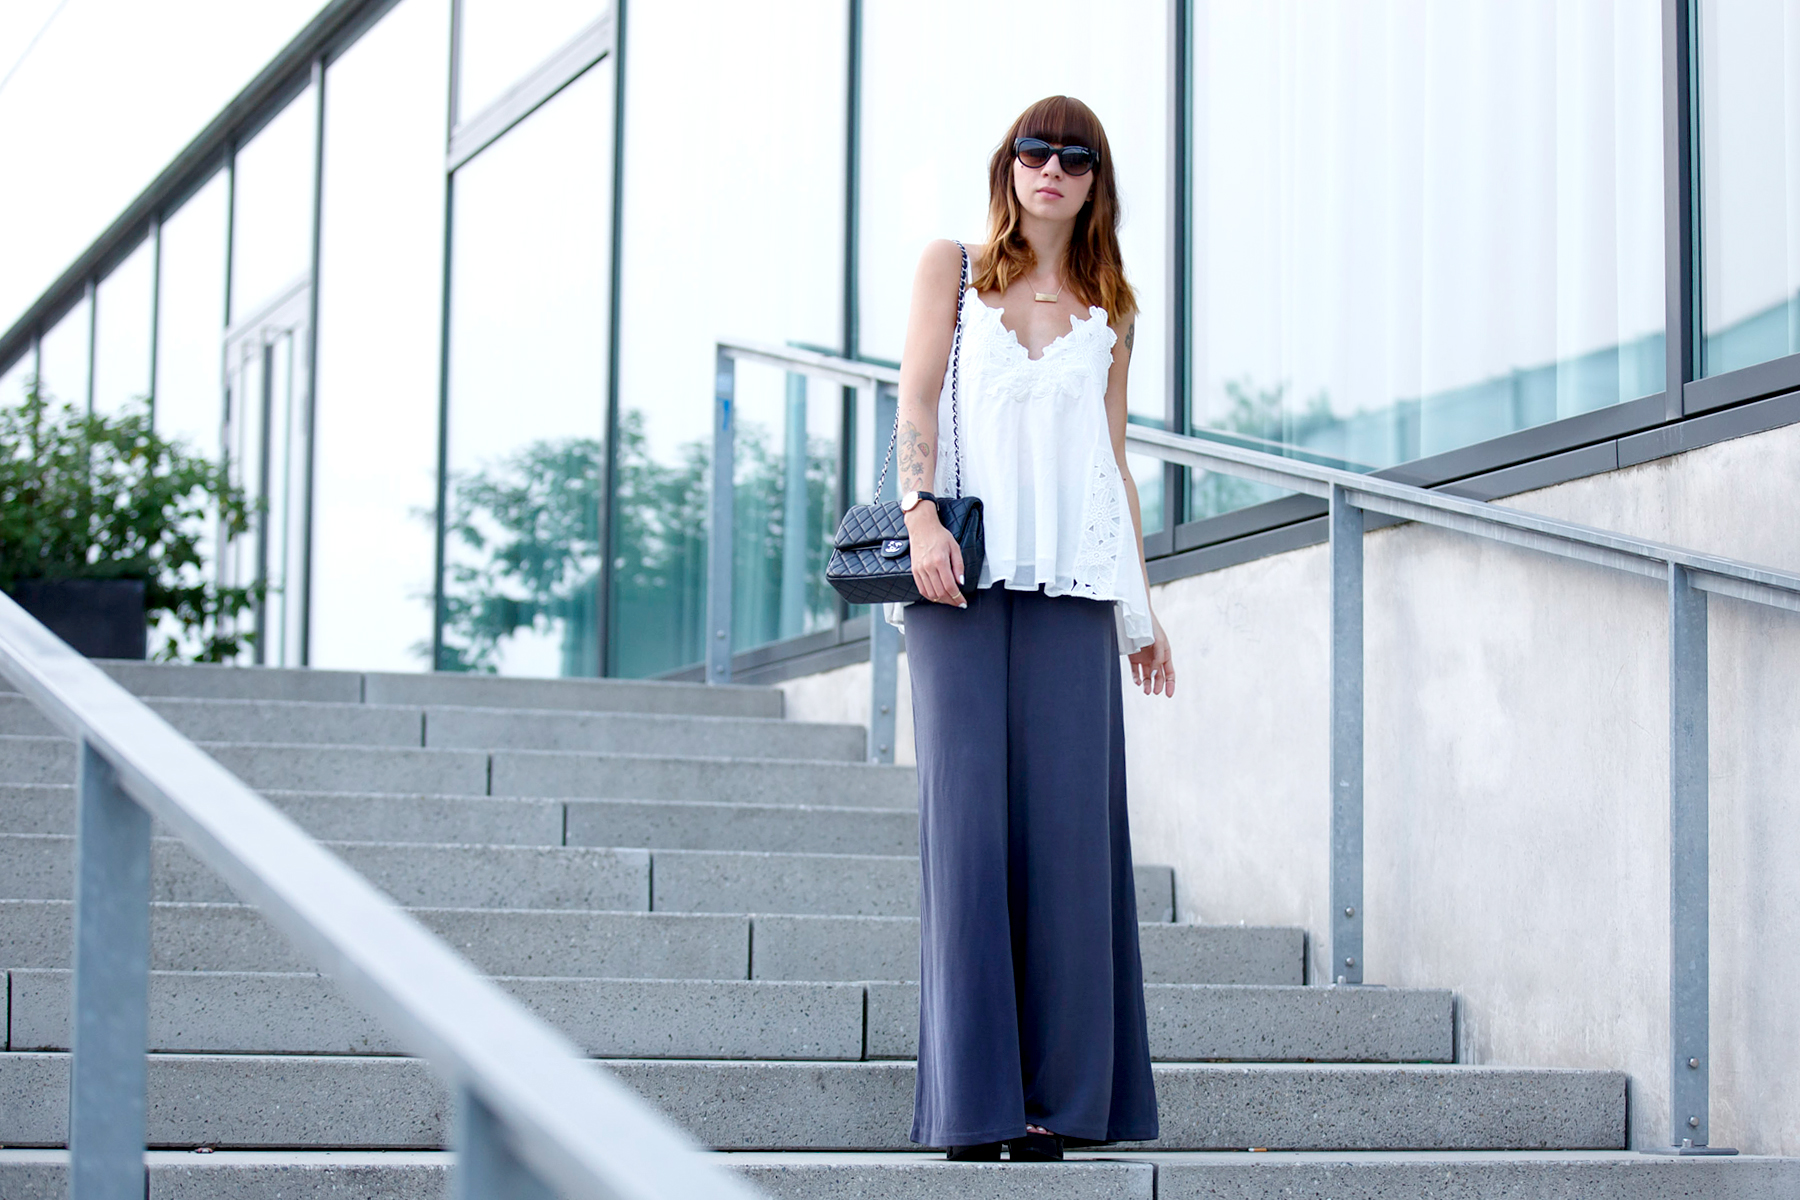 outfit vogue eyewear palazzo pants lace top summer evening dinner look cats & dogs ricarda schernus berlin düsseldorf modeblog 1